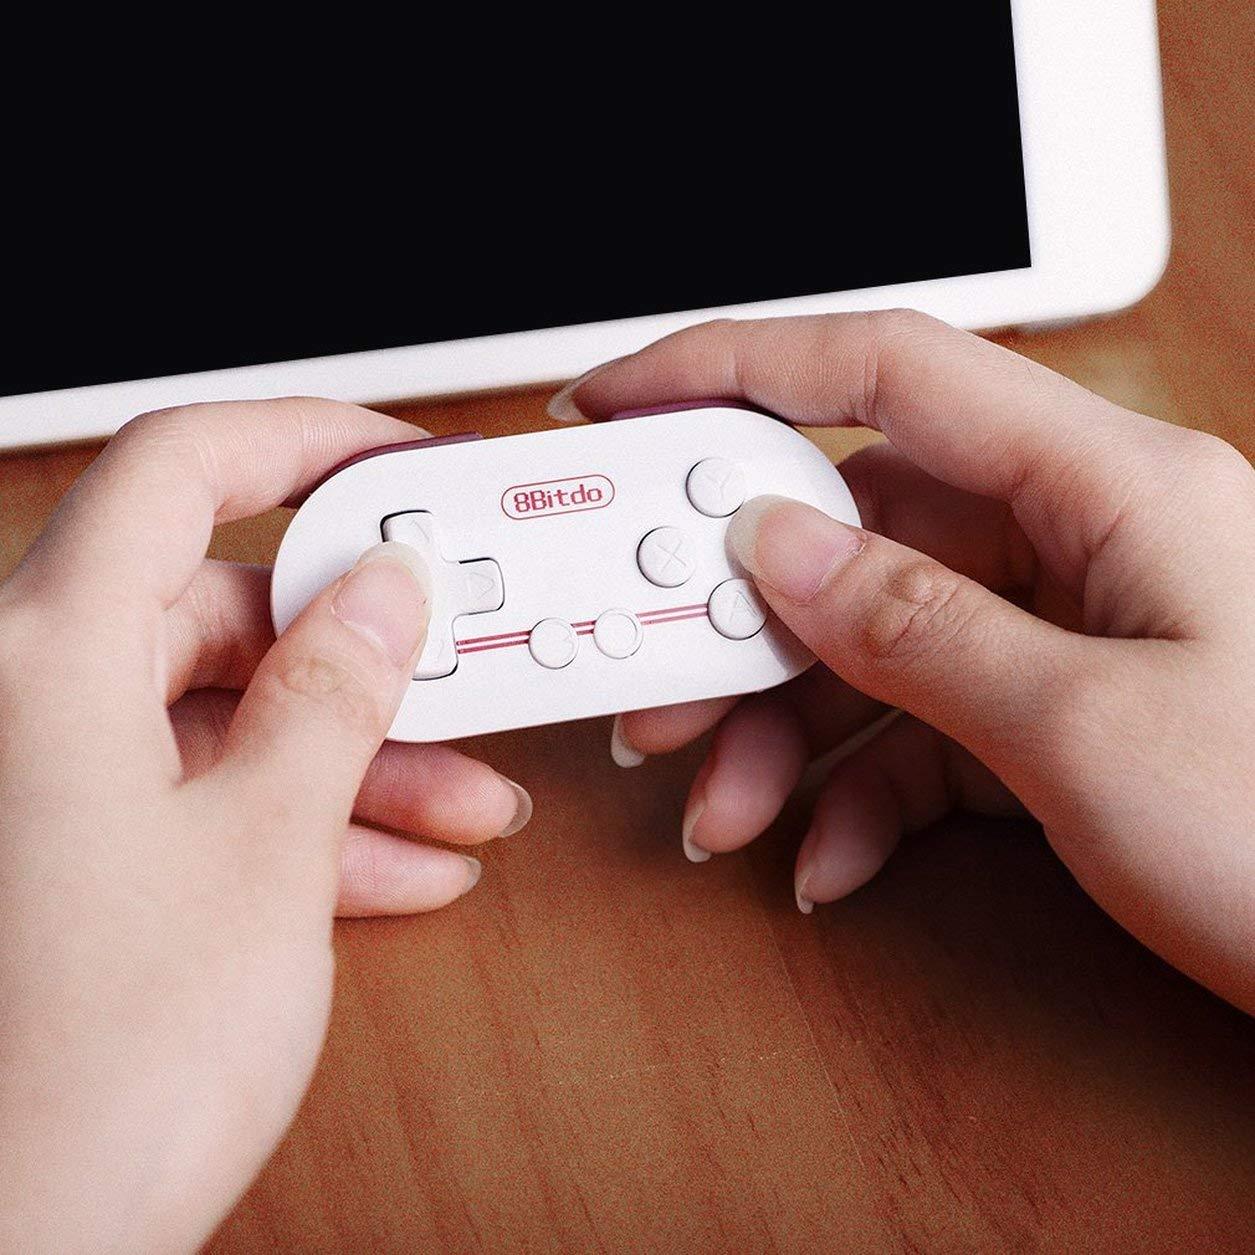 Dailyinshop Mini White Portable 8Bitdo Zero ABS Bluetooth Wireless Gamepad Game Controller Joypad Joystick con CPU Arm a 32 Bit